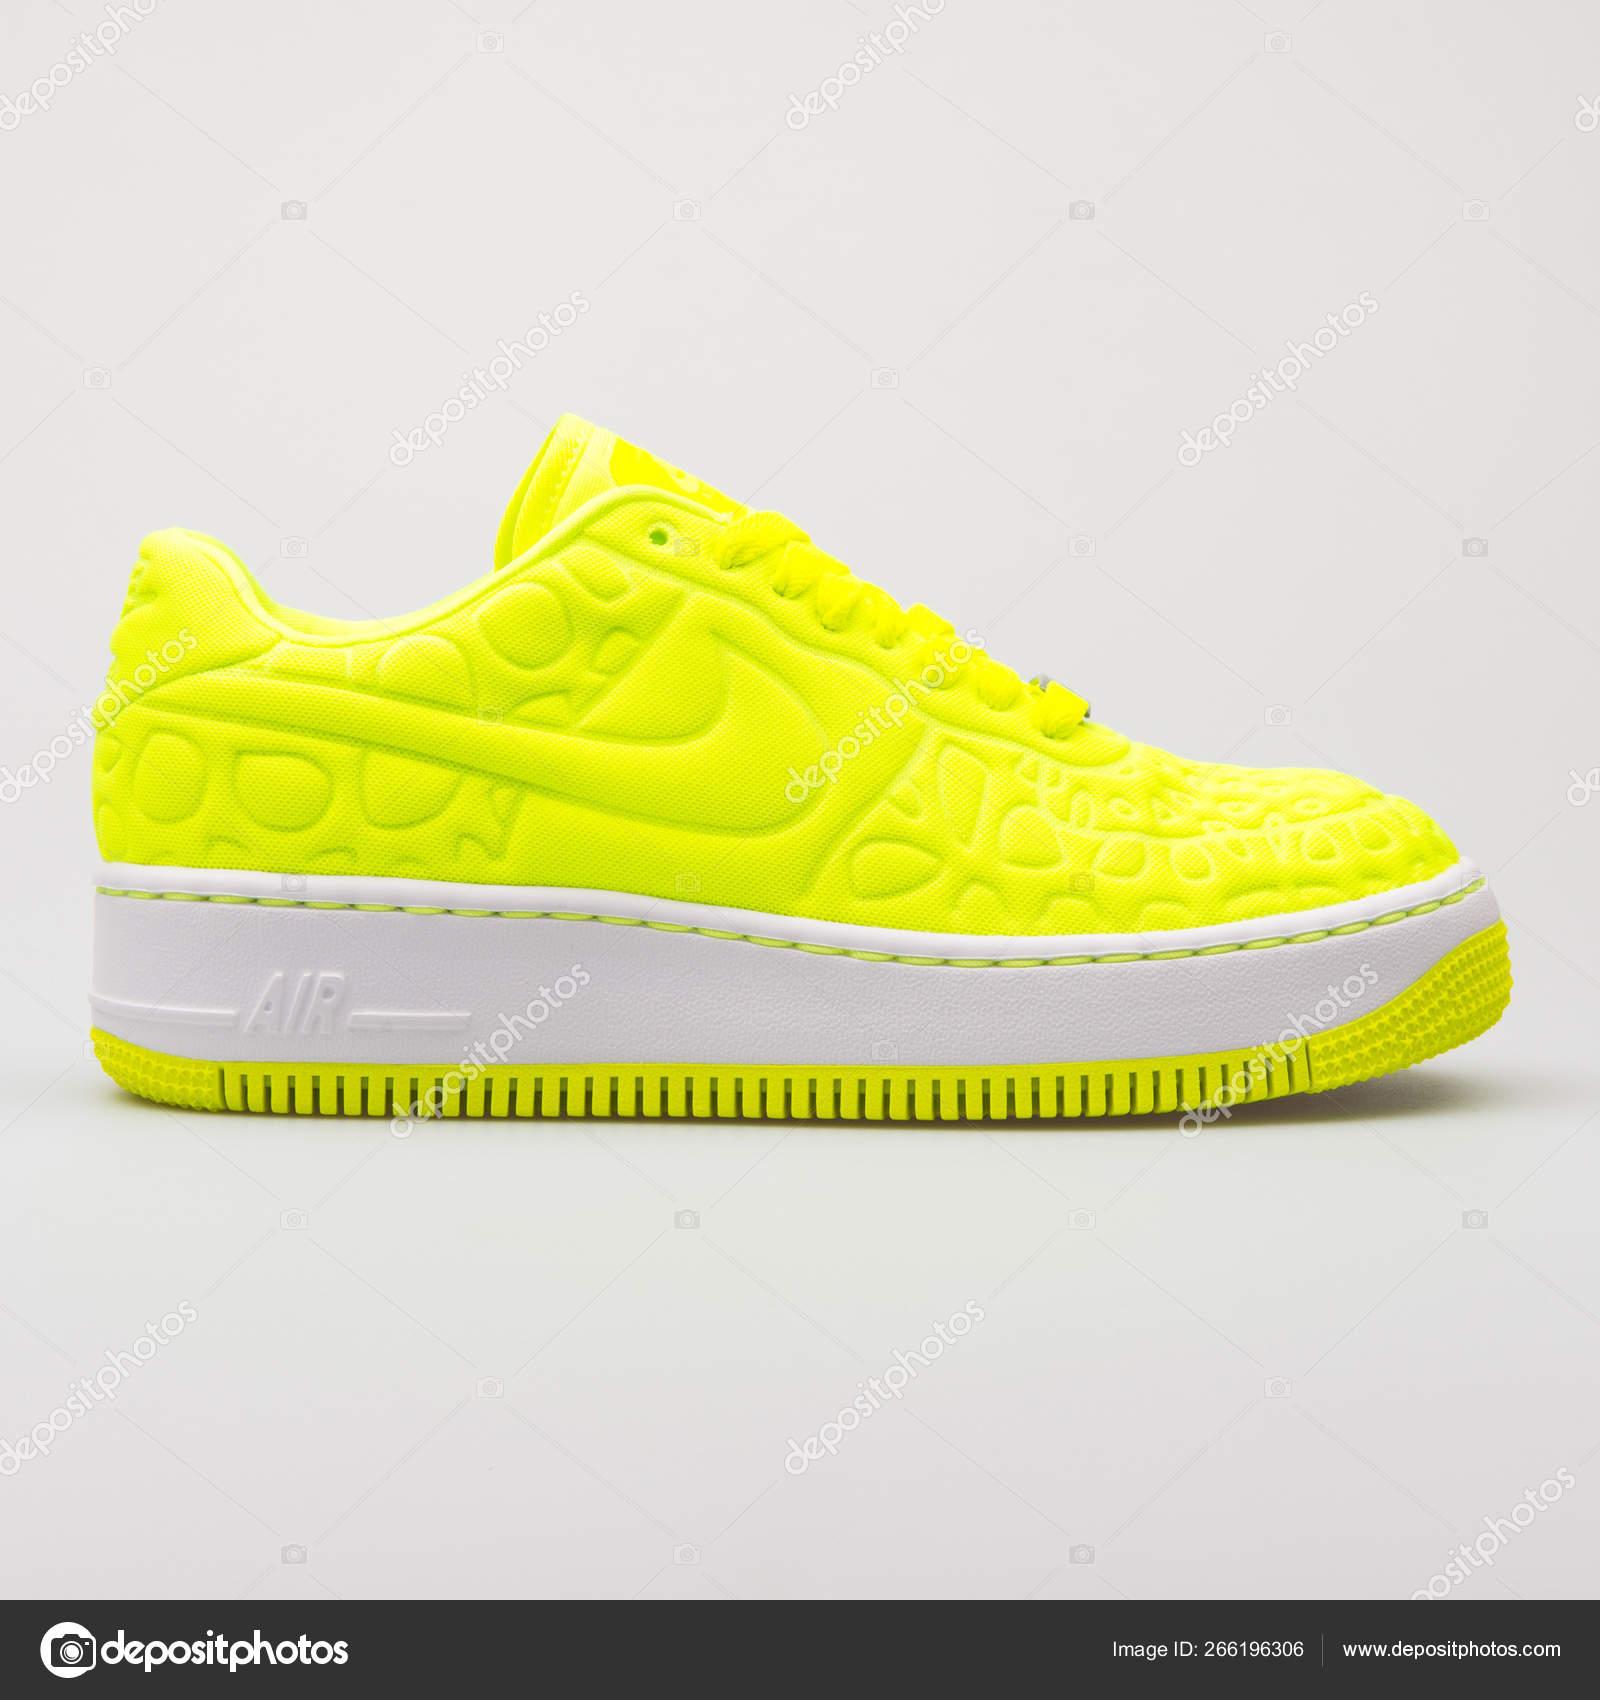 Nike Air Force 1 Upstep SE volt yellow